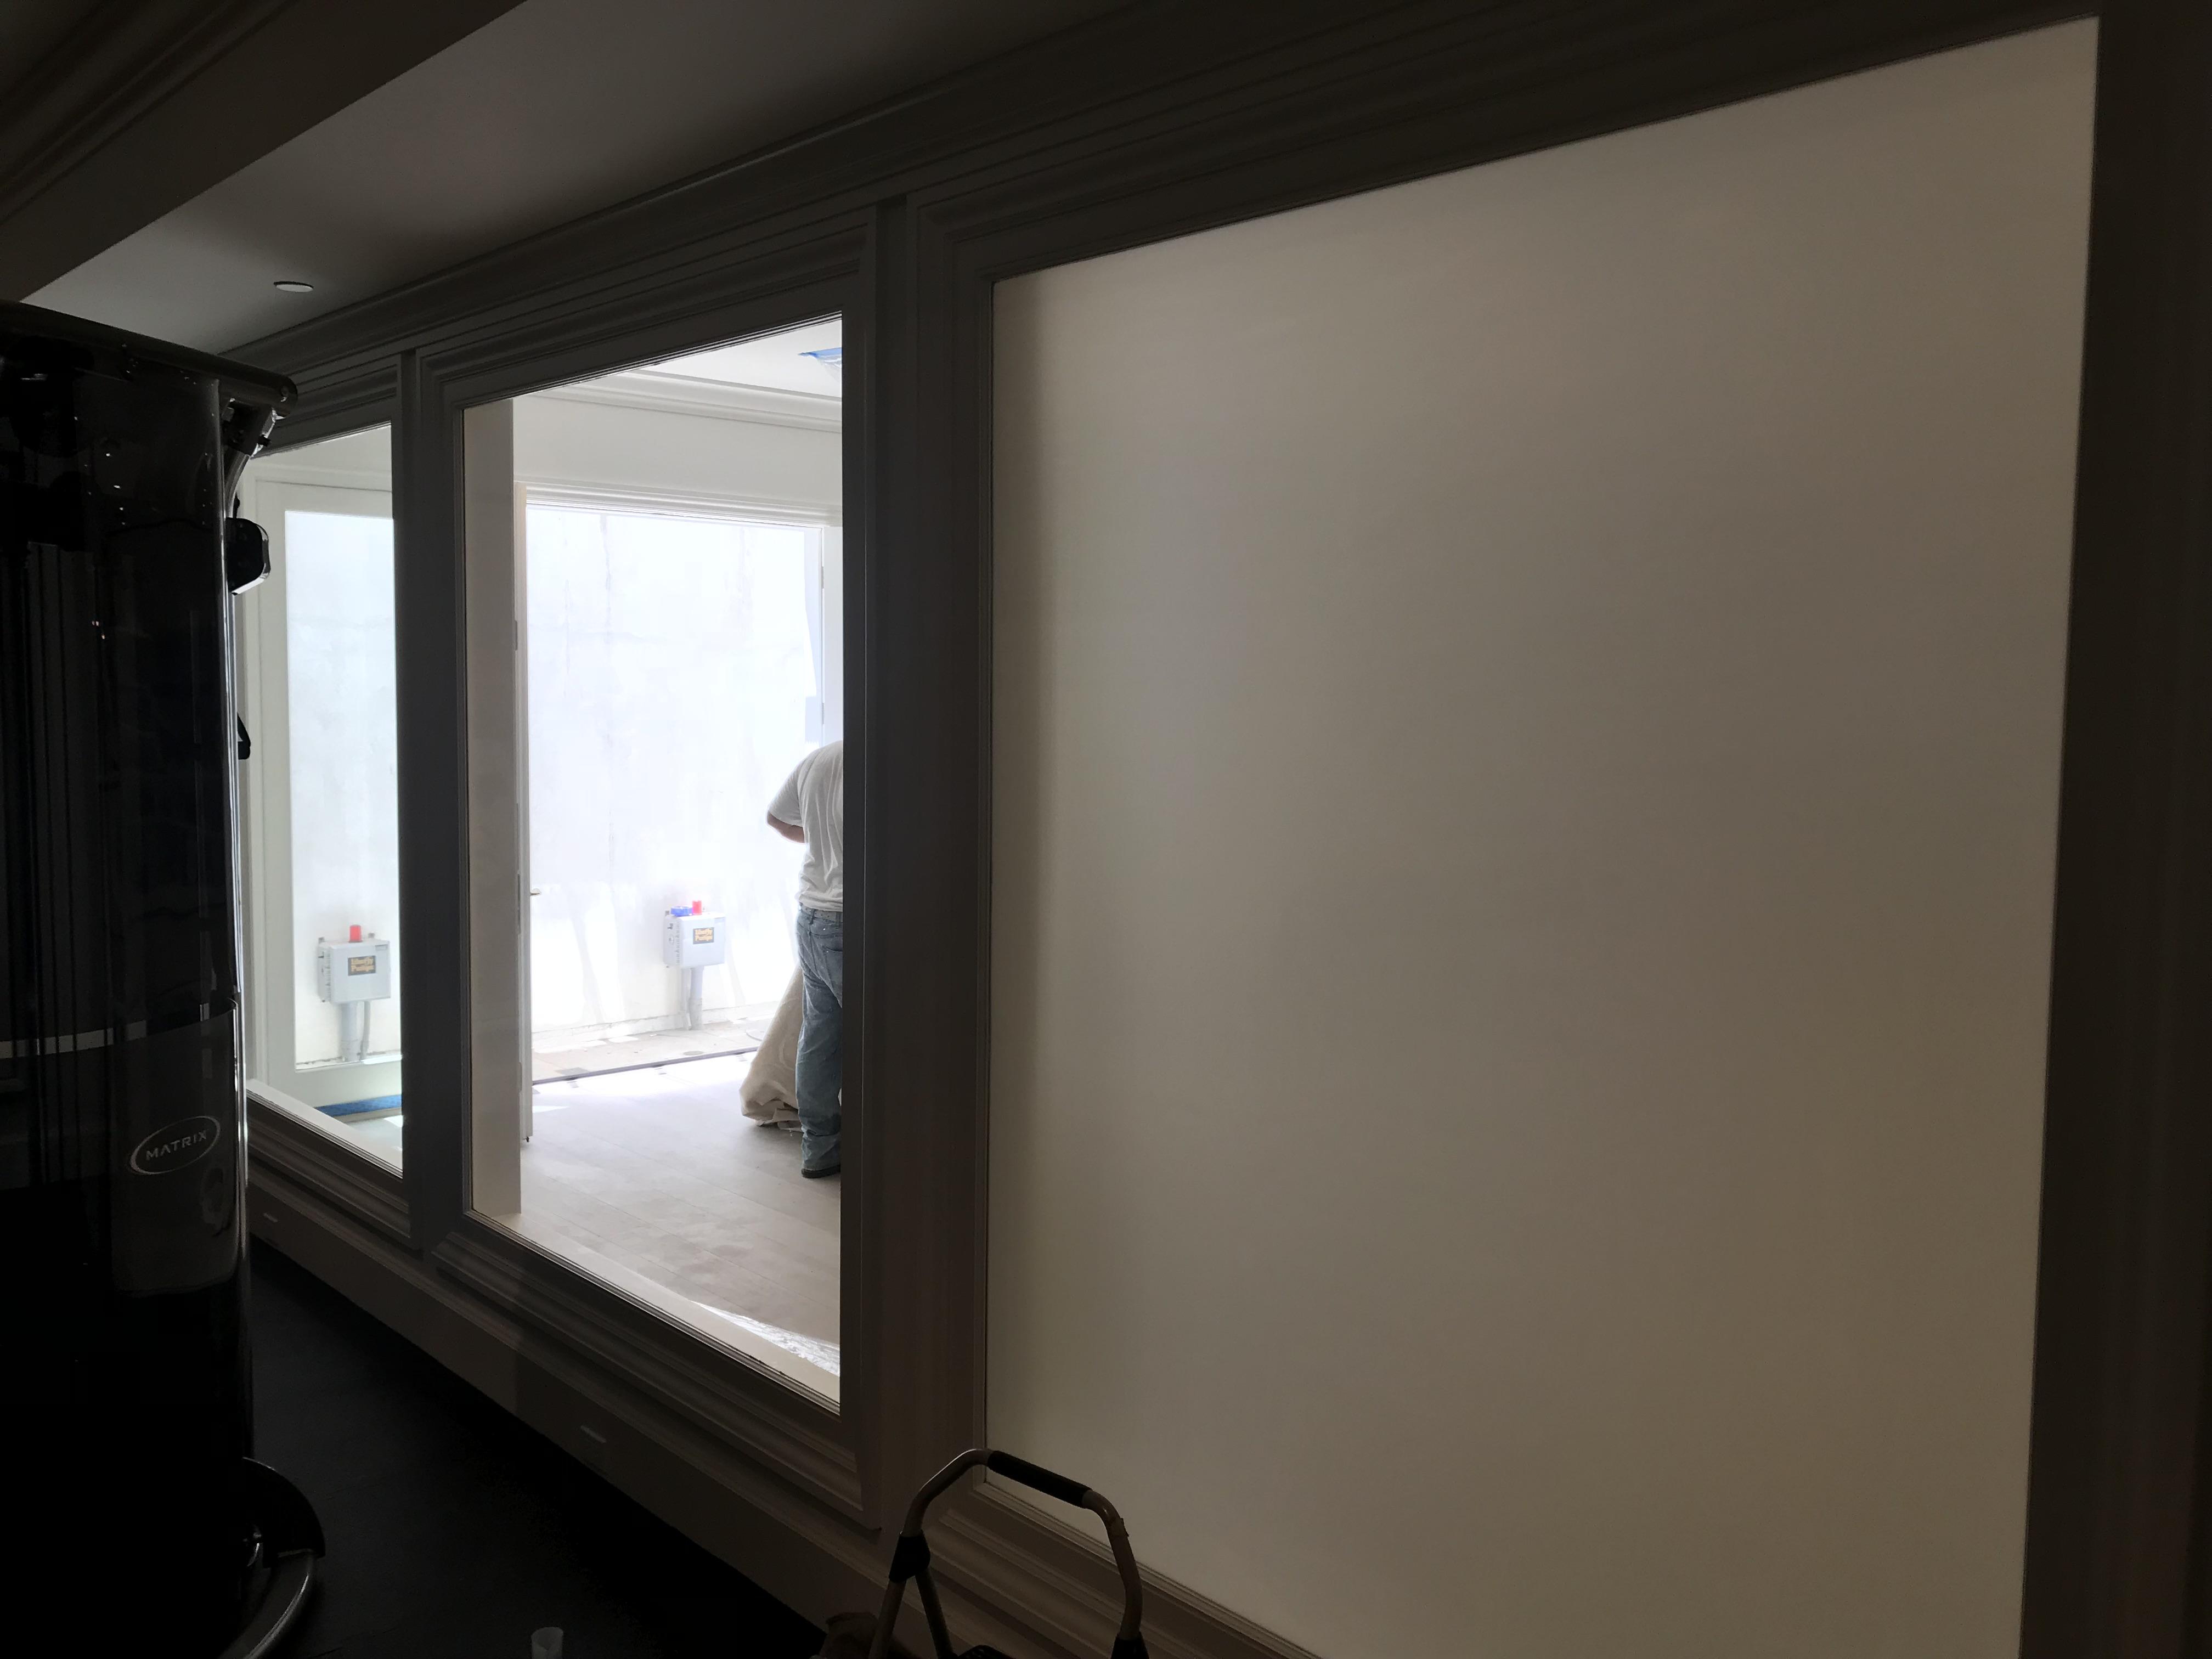 auto wrap, vinyl wrap, car wrap, window tinting, best window tint shop, 3m window tint, llumar ceramic tint